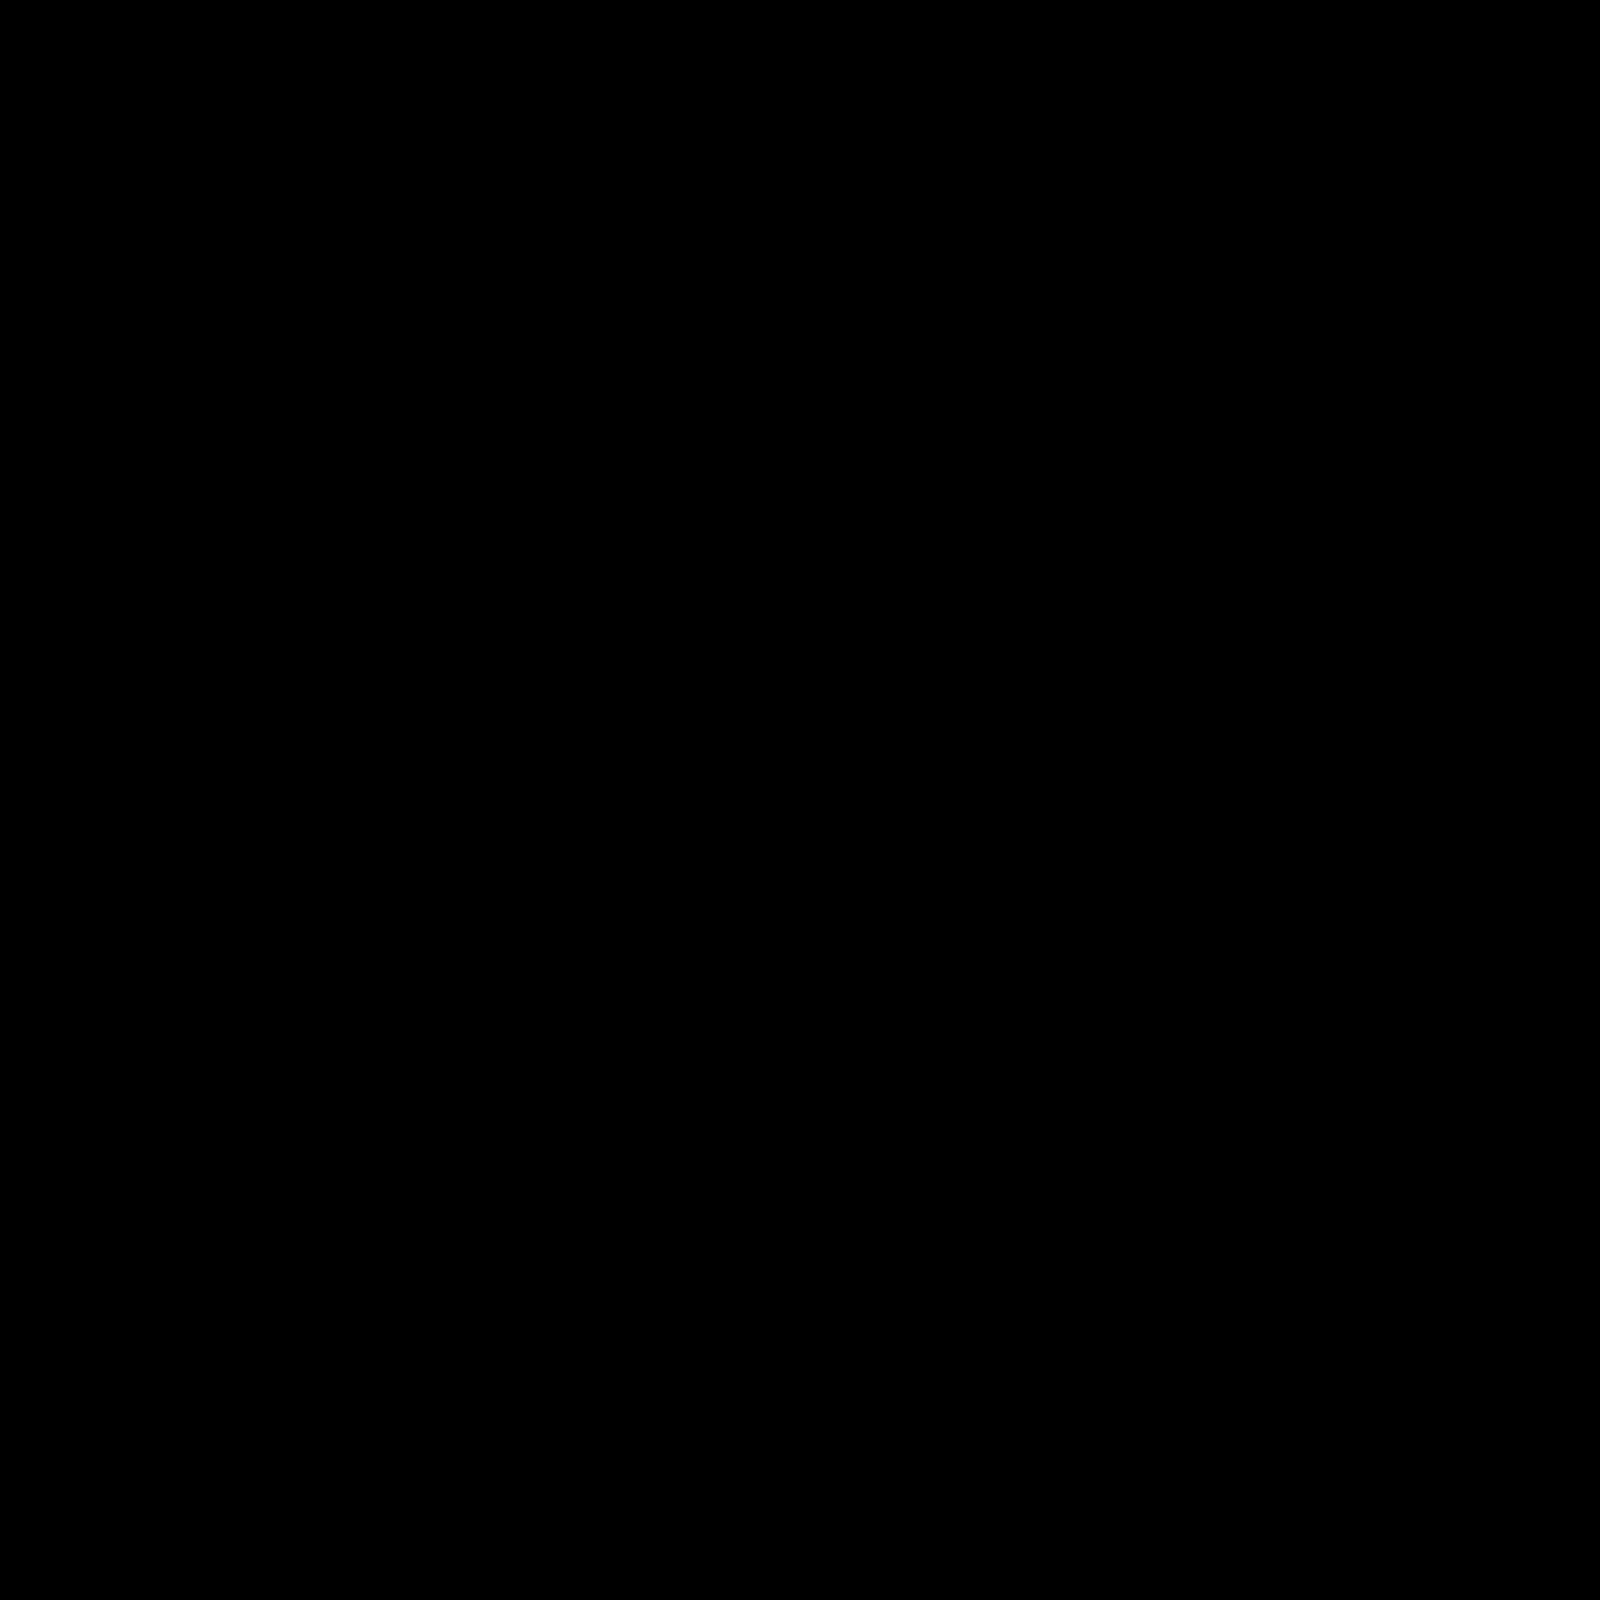 vector freeuse library Vector emblem shape. World health organization icon